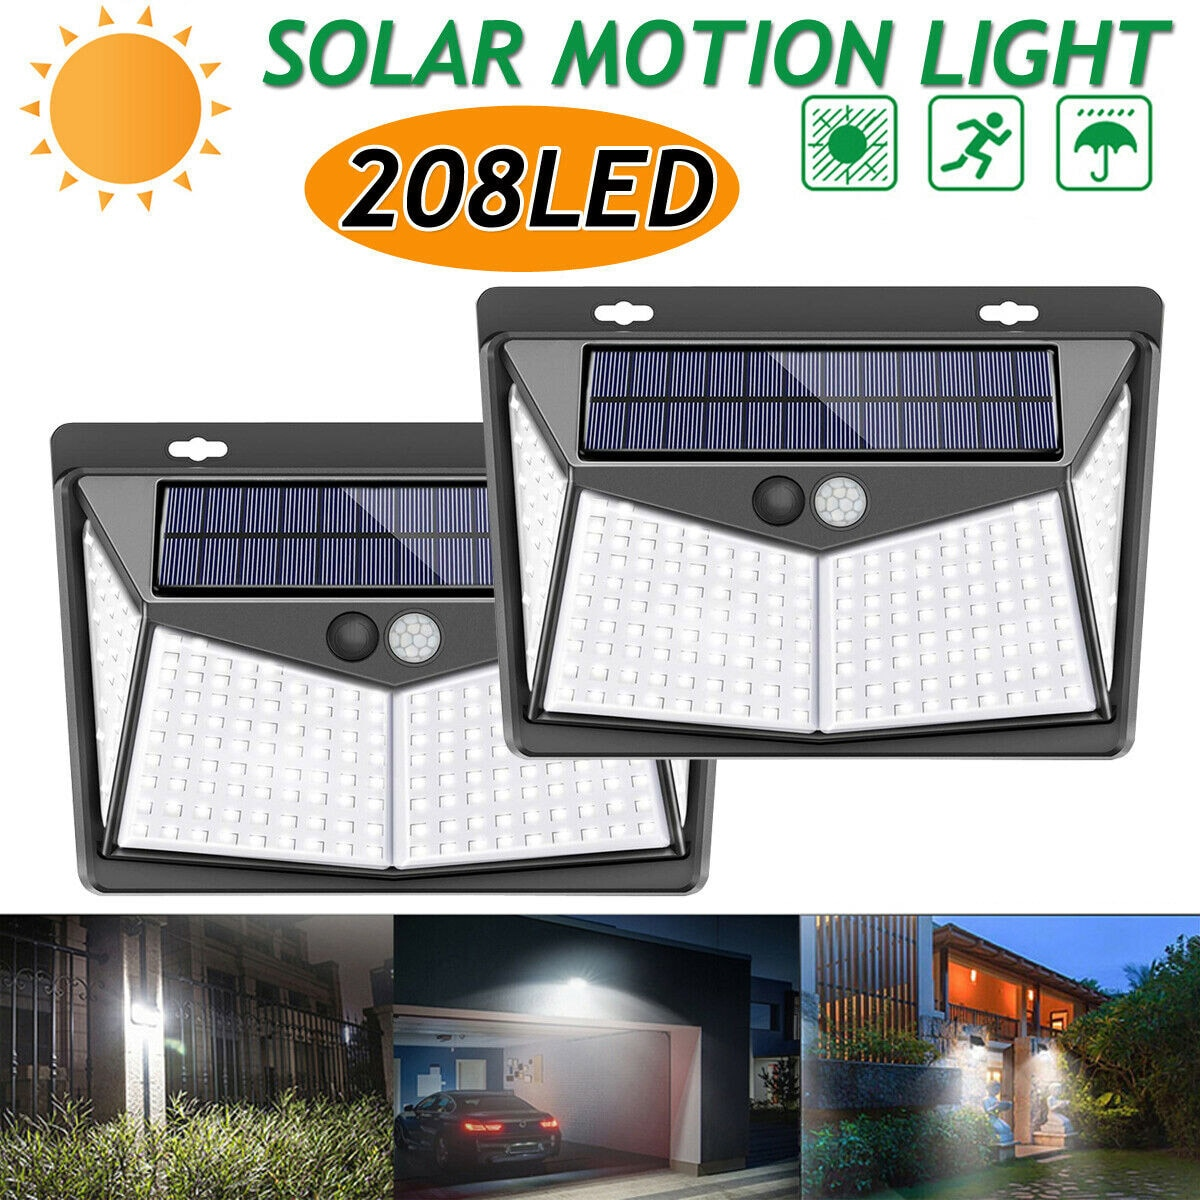 208 LED Solar Lights Outdoor Led Solar Powered Motion Sensor Lamp 3 Modes IP65 Waterproof Garden Wall Light For Patio Road